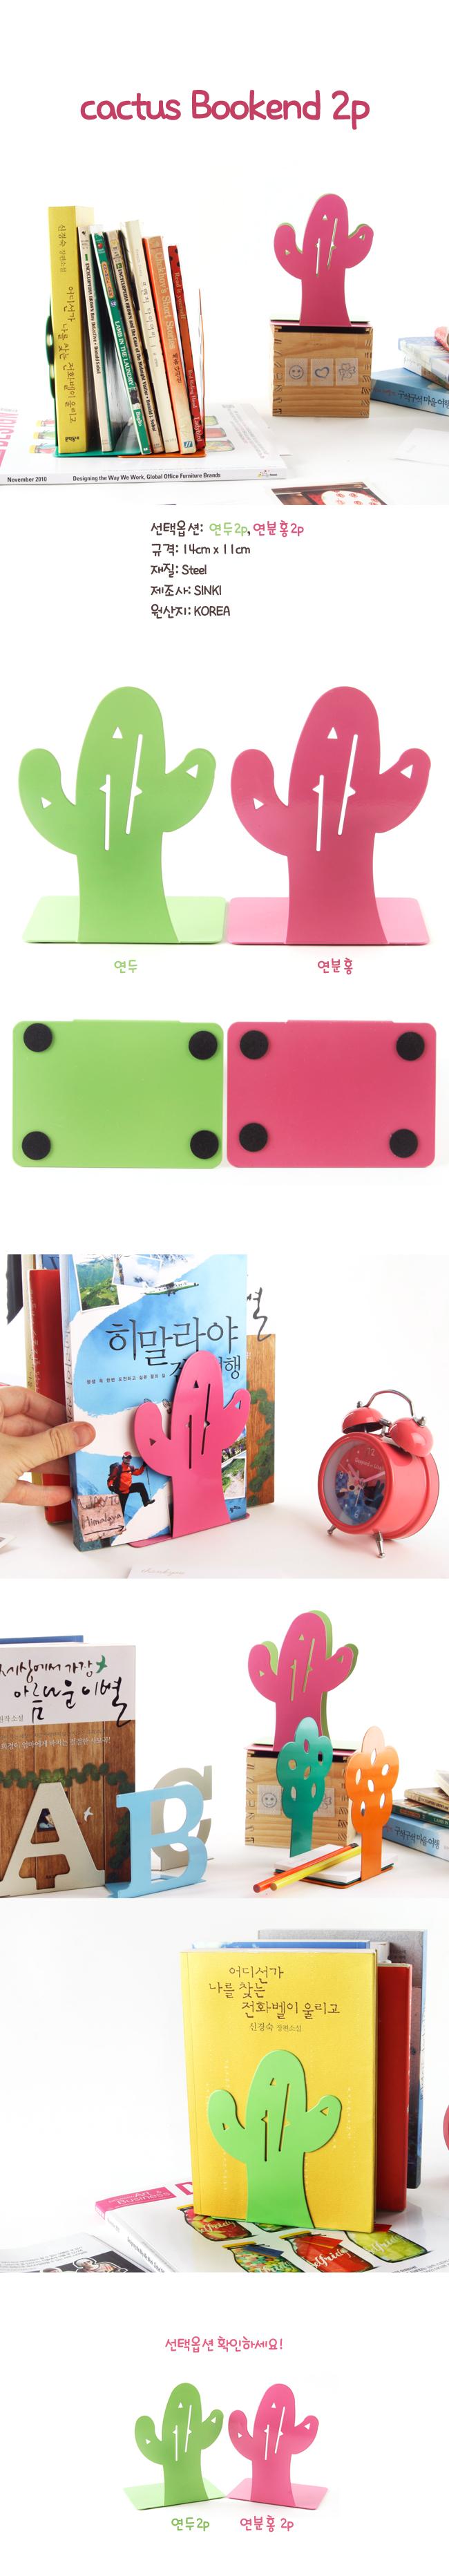 cactus bookend 2P - 신기, 4,500원, 독서용품, 북앤드